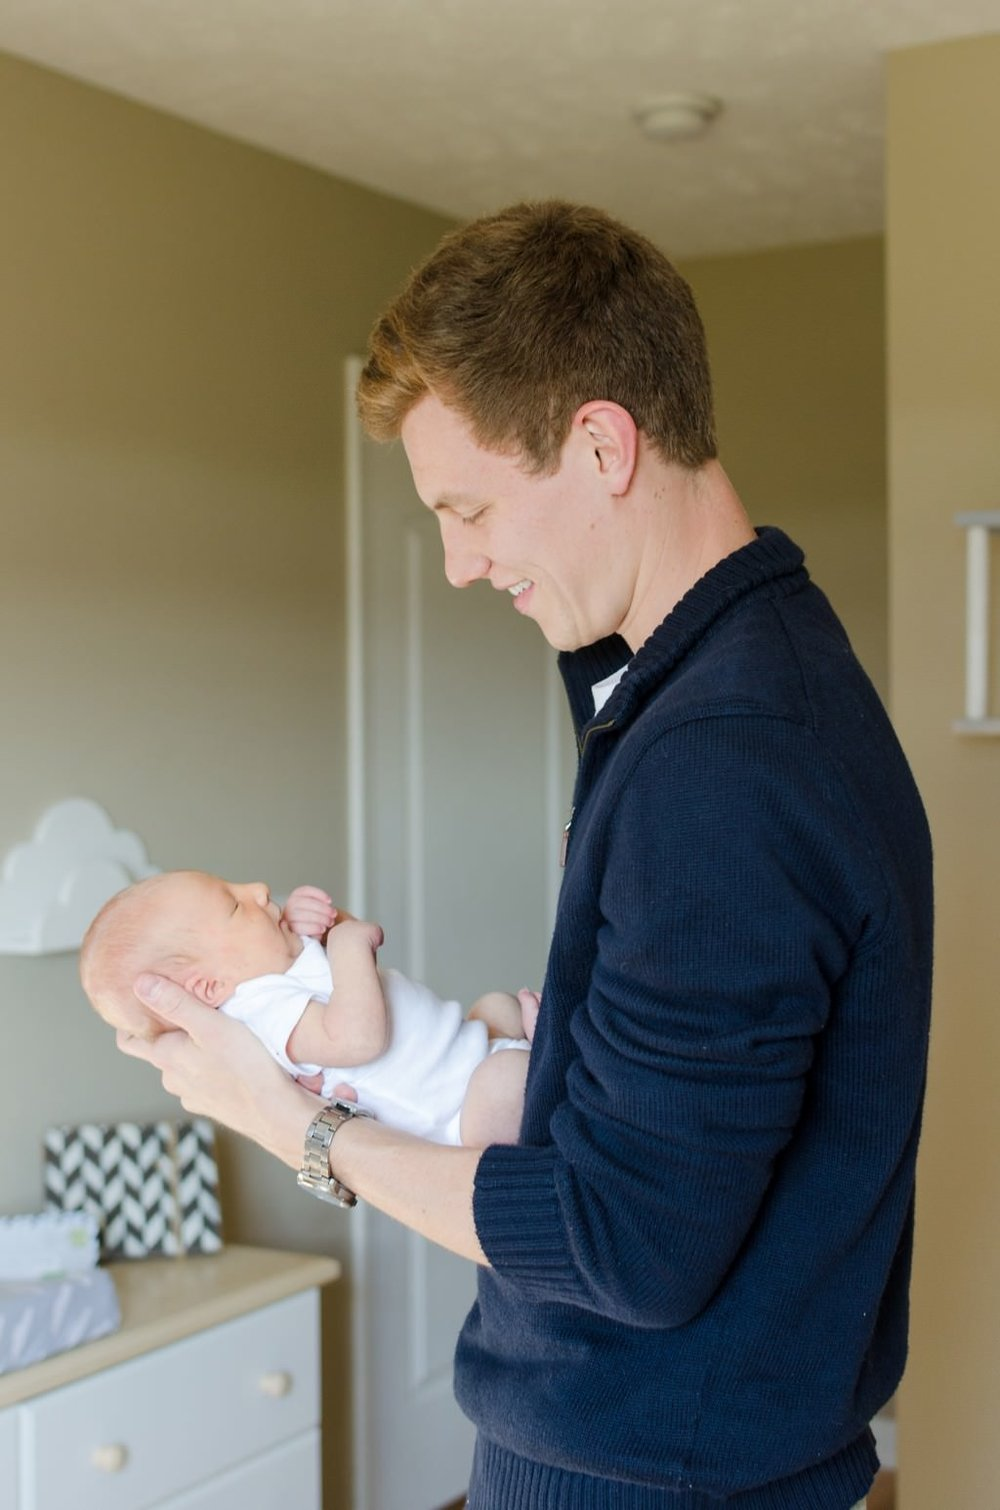 Noah-In-Home-Lifestyle-Newborn-Session-Murfreesboro-Nashville-Photographers+13